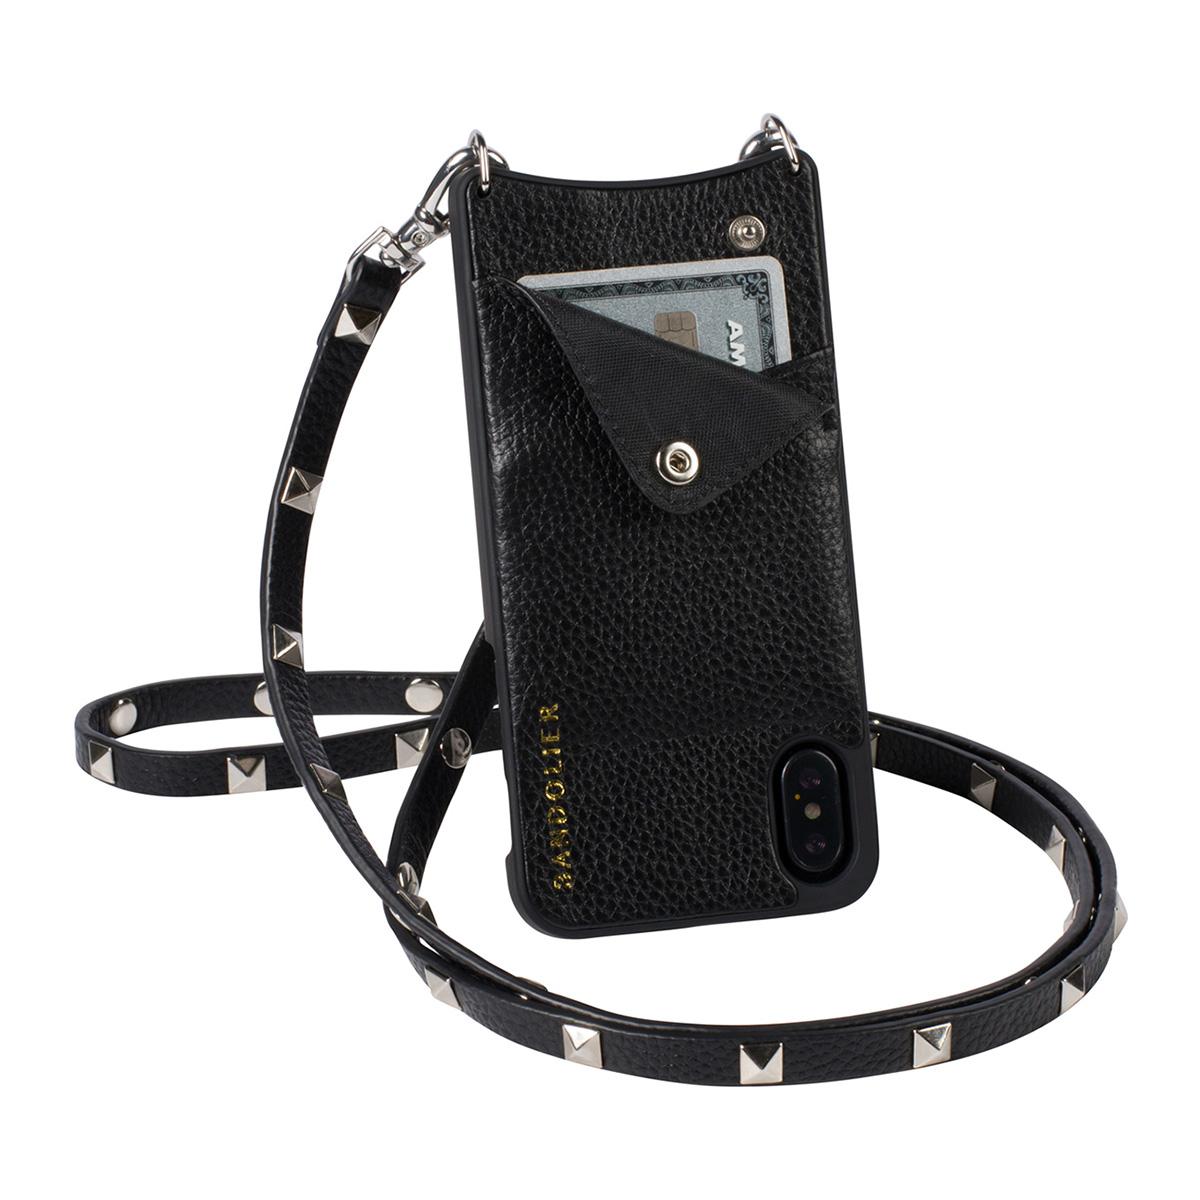 BANDOLIER iPhone XR SARAH SILVER バンドリヤー ケース ショルダー スマホ アイフォン レザー メンズ レディース ブラック 10SAR1001 [191]